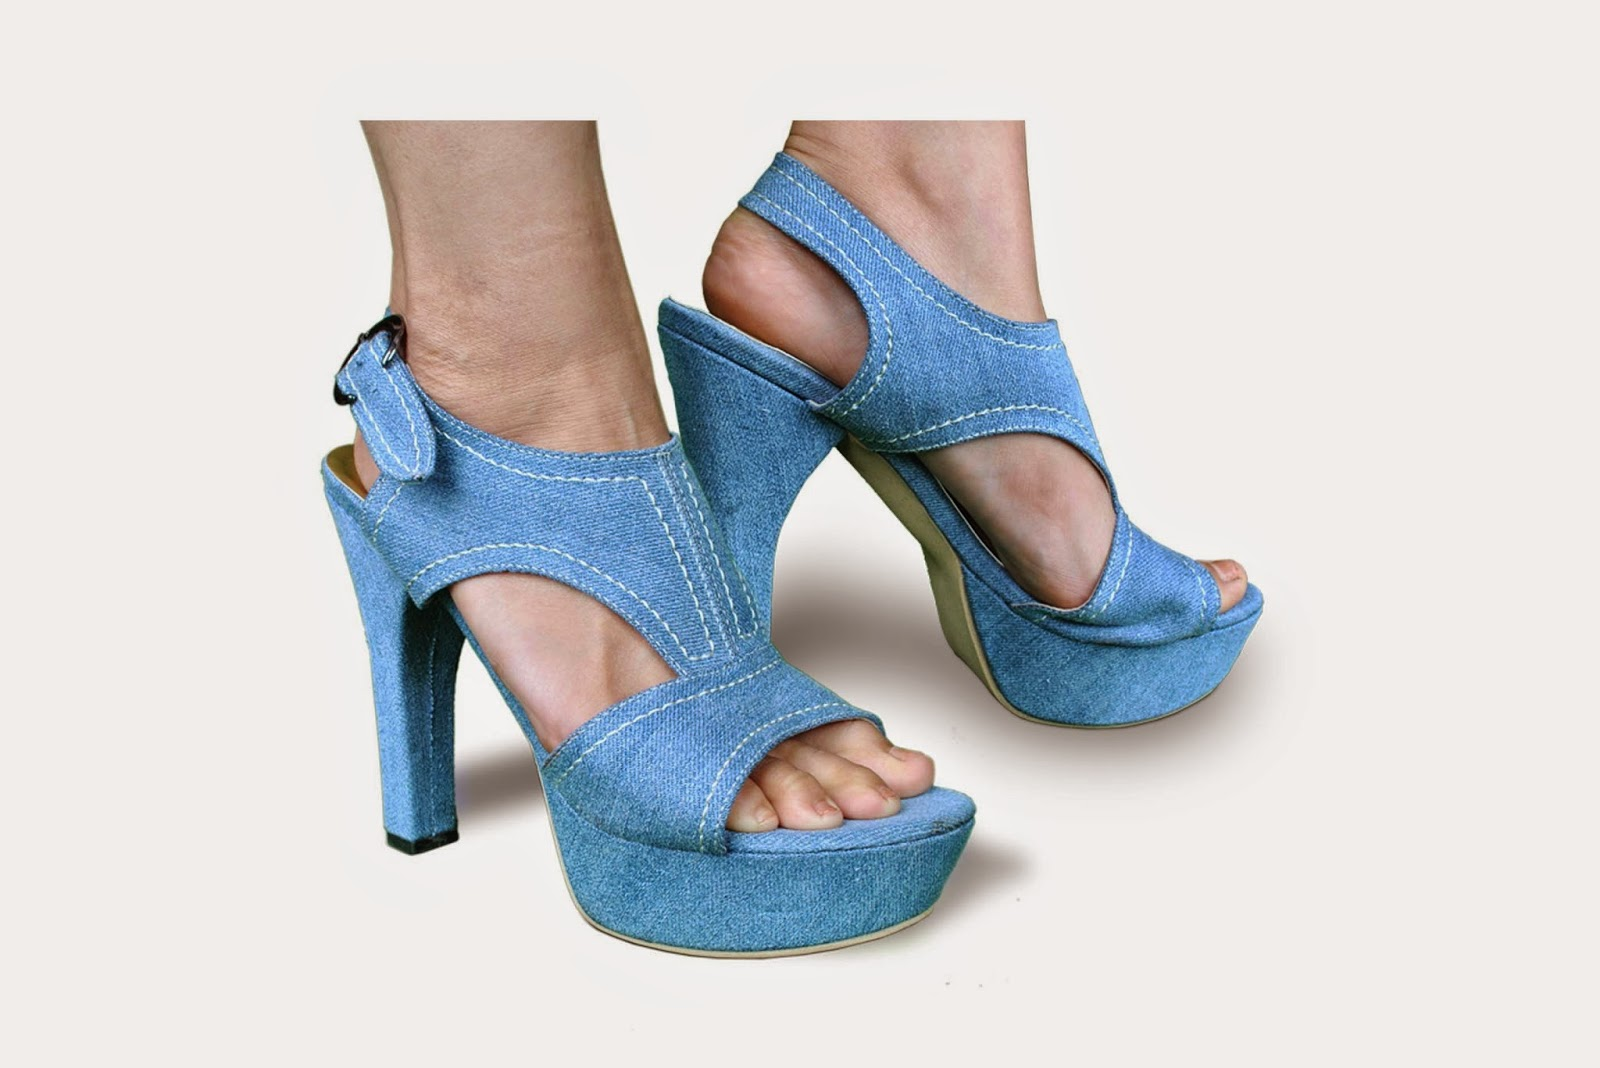 Toko Sepatu Online Cibaduyut Grosir Sepatu Murah Grosir Sandal